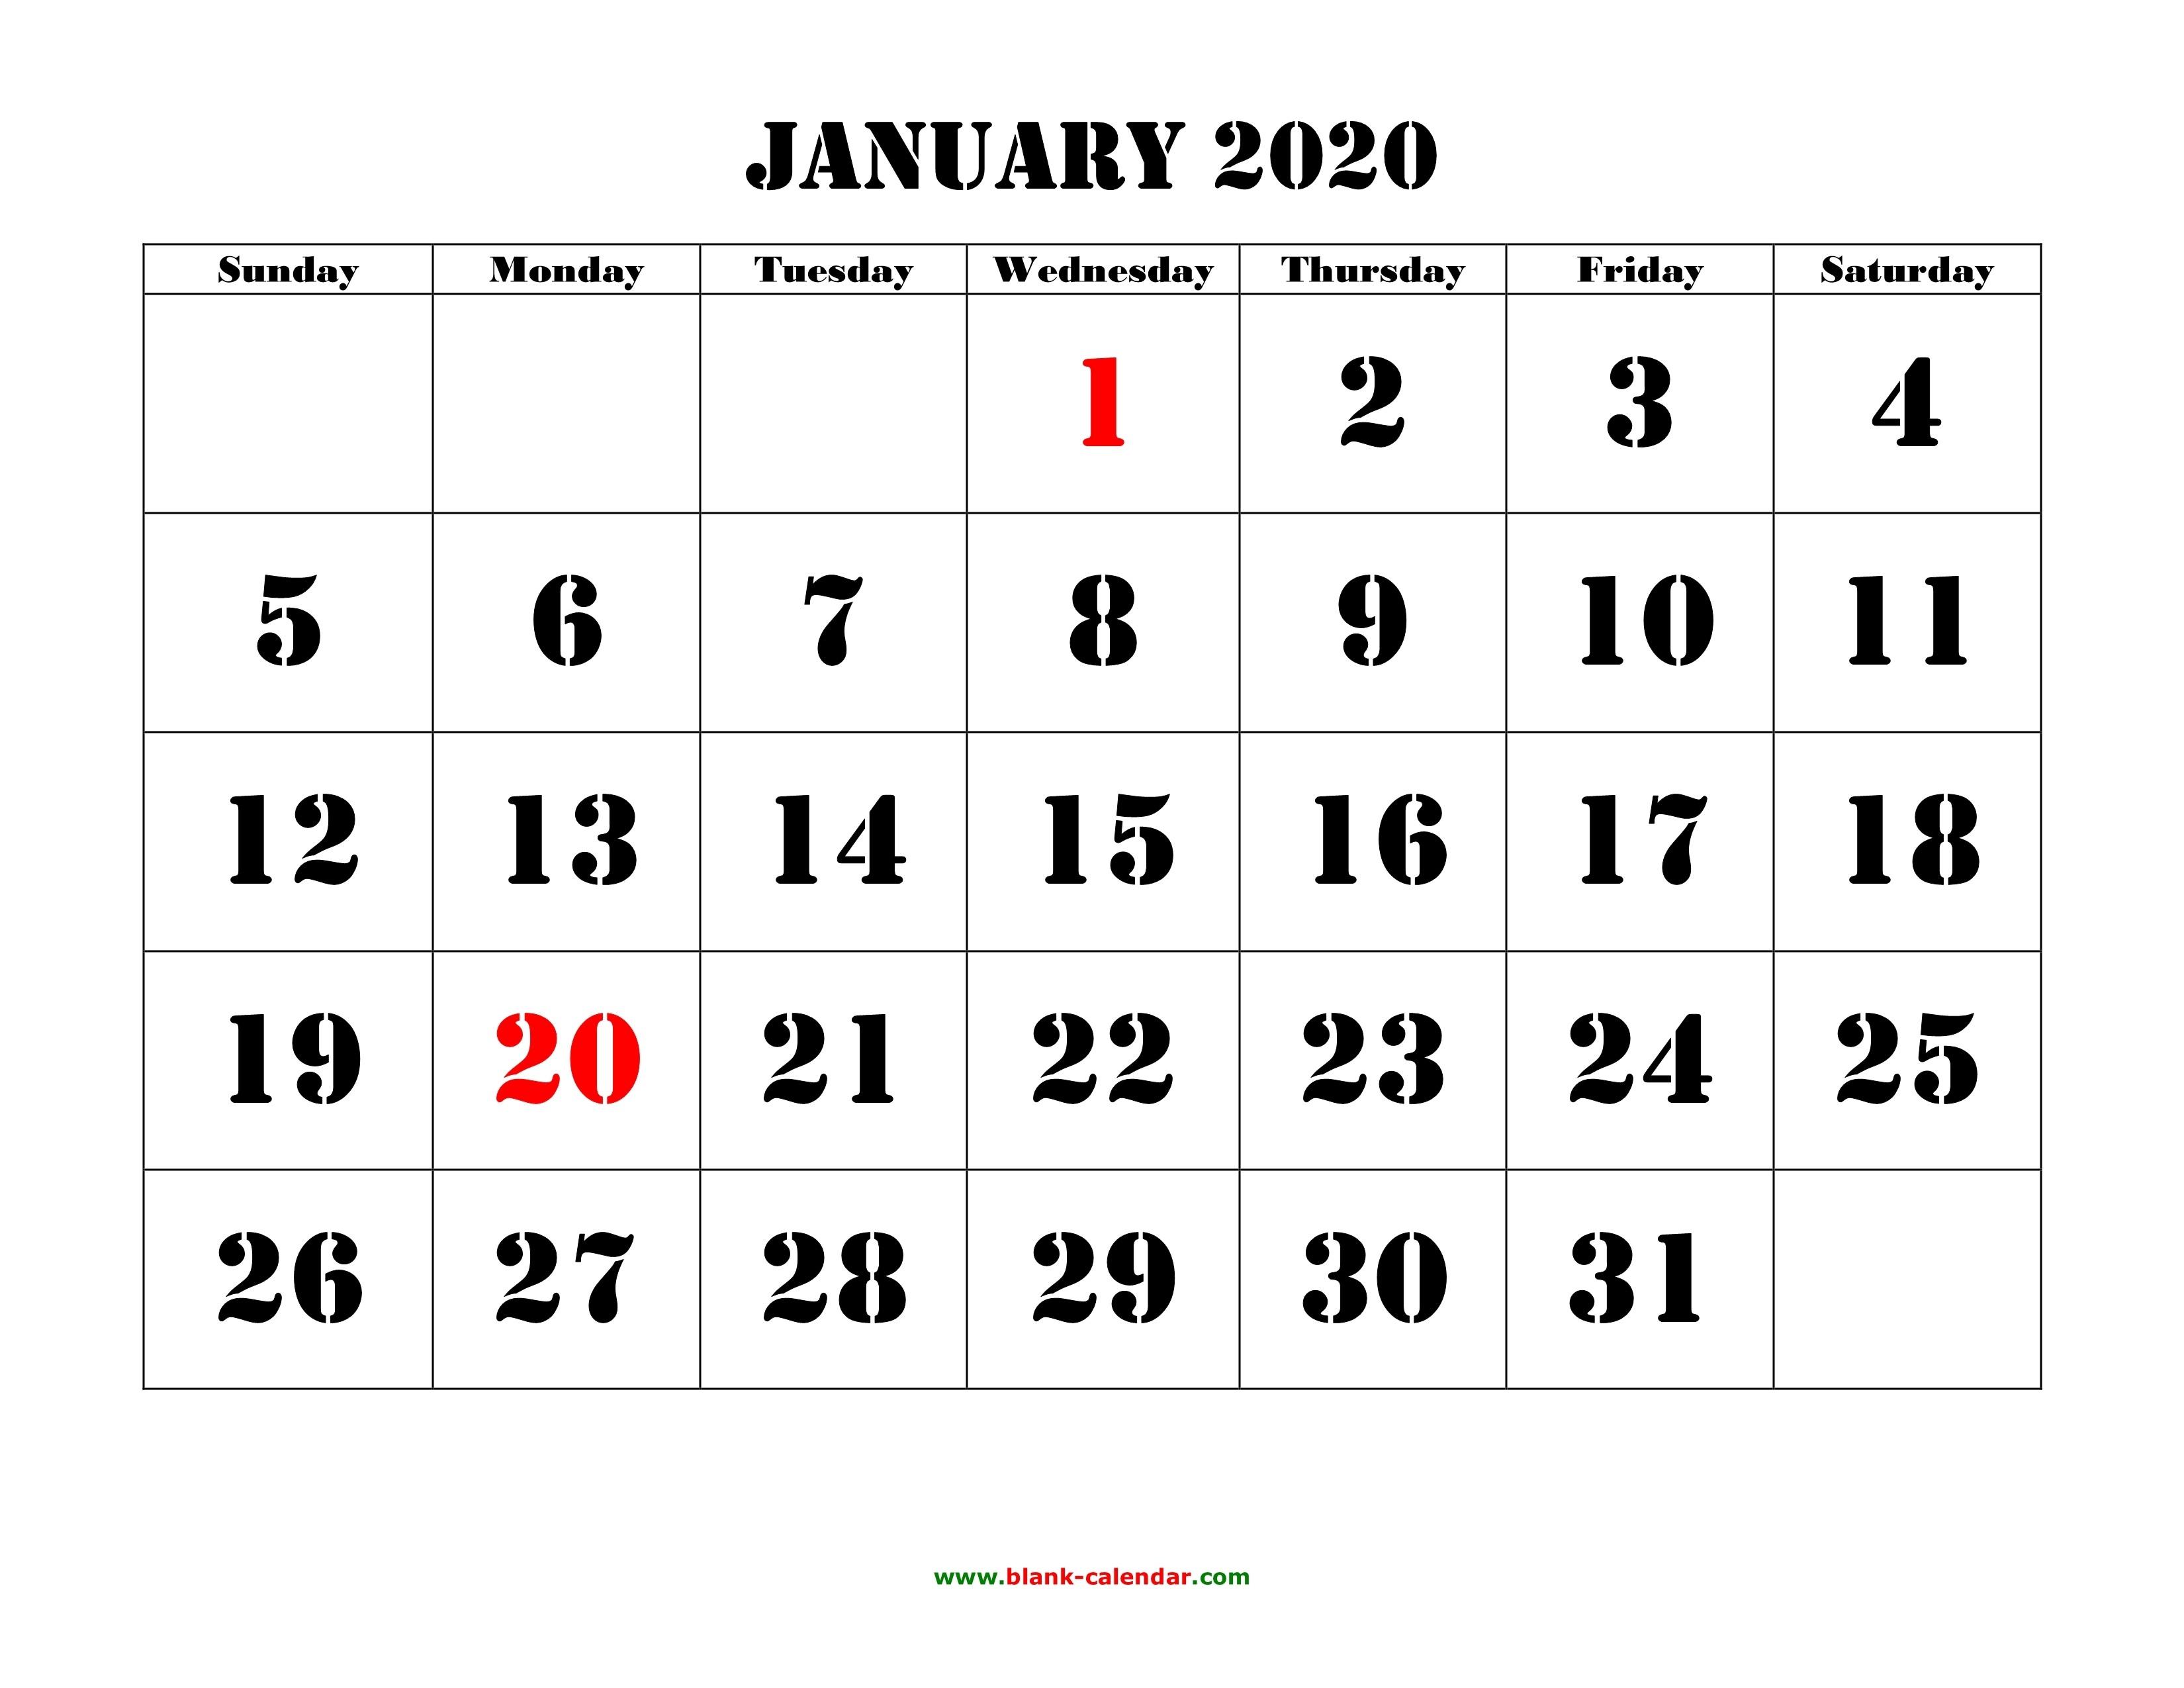 Printable January 2020 Calendar - Free Blank Templates-2020 Calendar With Holidays Usa Printable Year In Advance